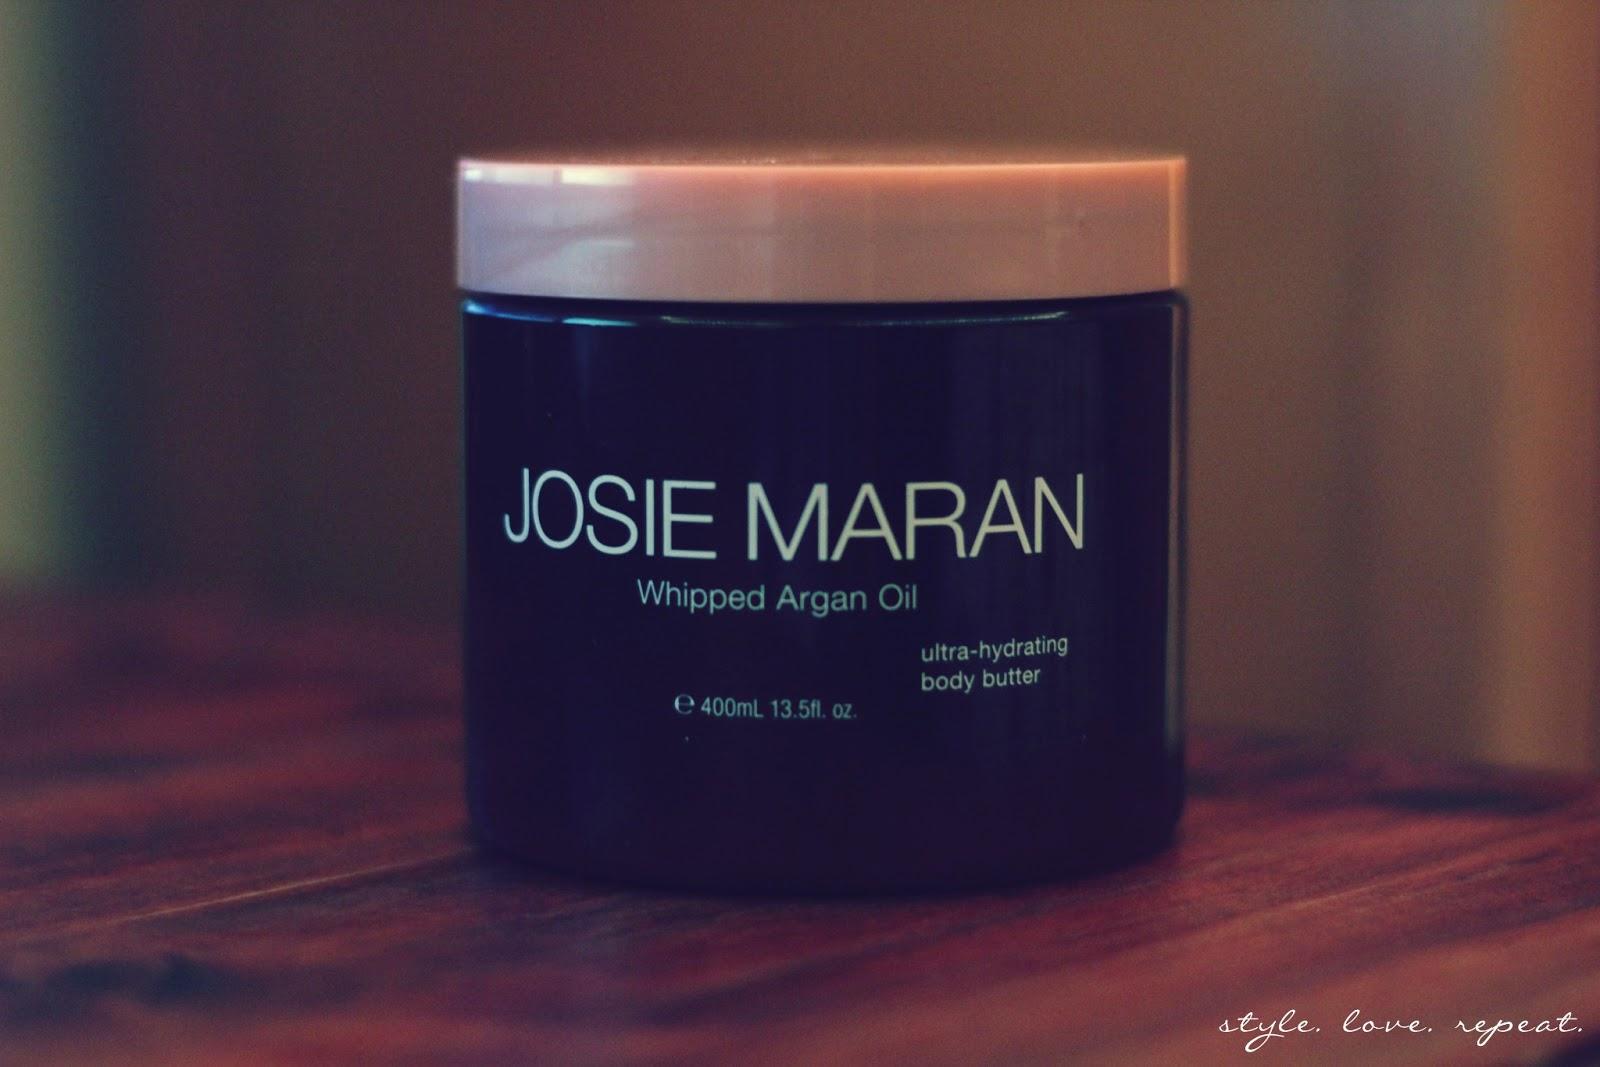 Josie Maran Whipped Argan Oil Ultra-Hydrating Body ButterJosie Maran Argan Oil